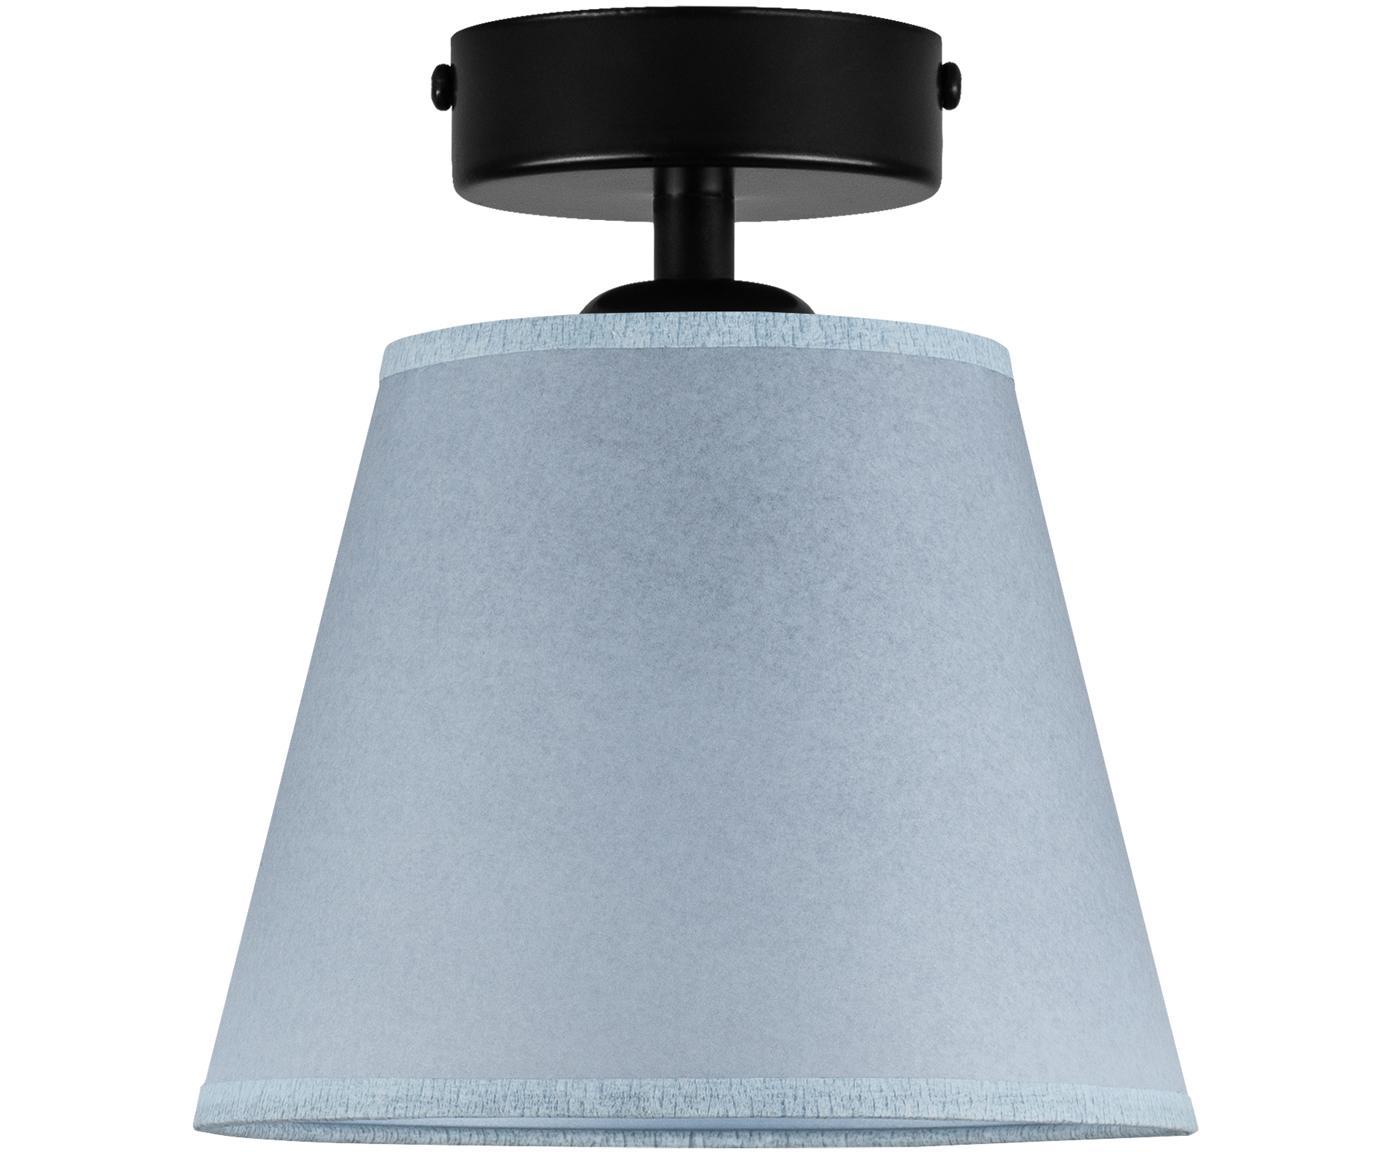 Plafoniera in carta Iro, Paralume: carta, Baldacchino: metallo verniciato a polv, Blu, nero, Ø 16 x Alt. 18 cm